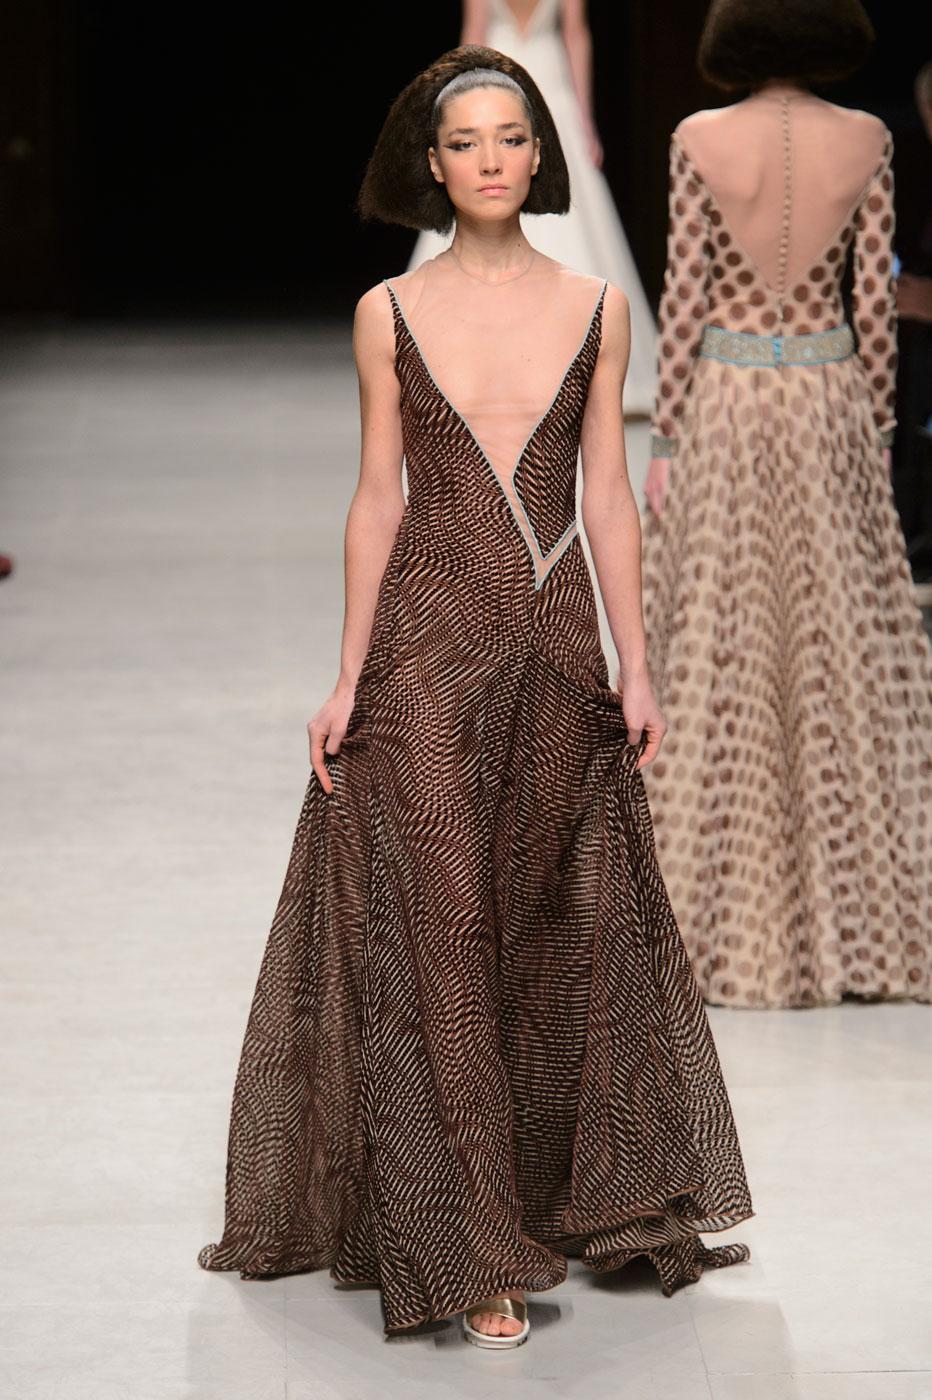 Julien-Fournie-Prive-fashion-runway-show-haute-couture-paris-spring-2015-the-impression-40